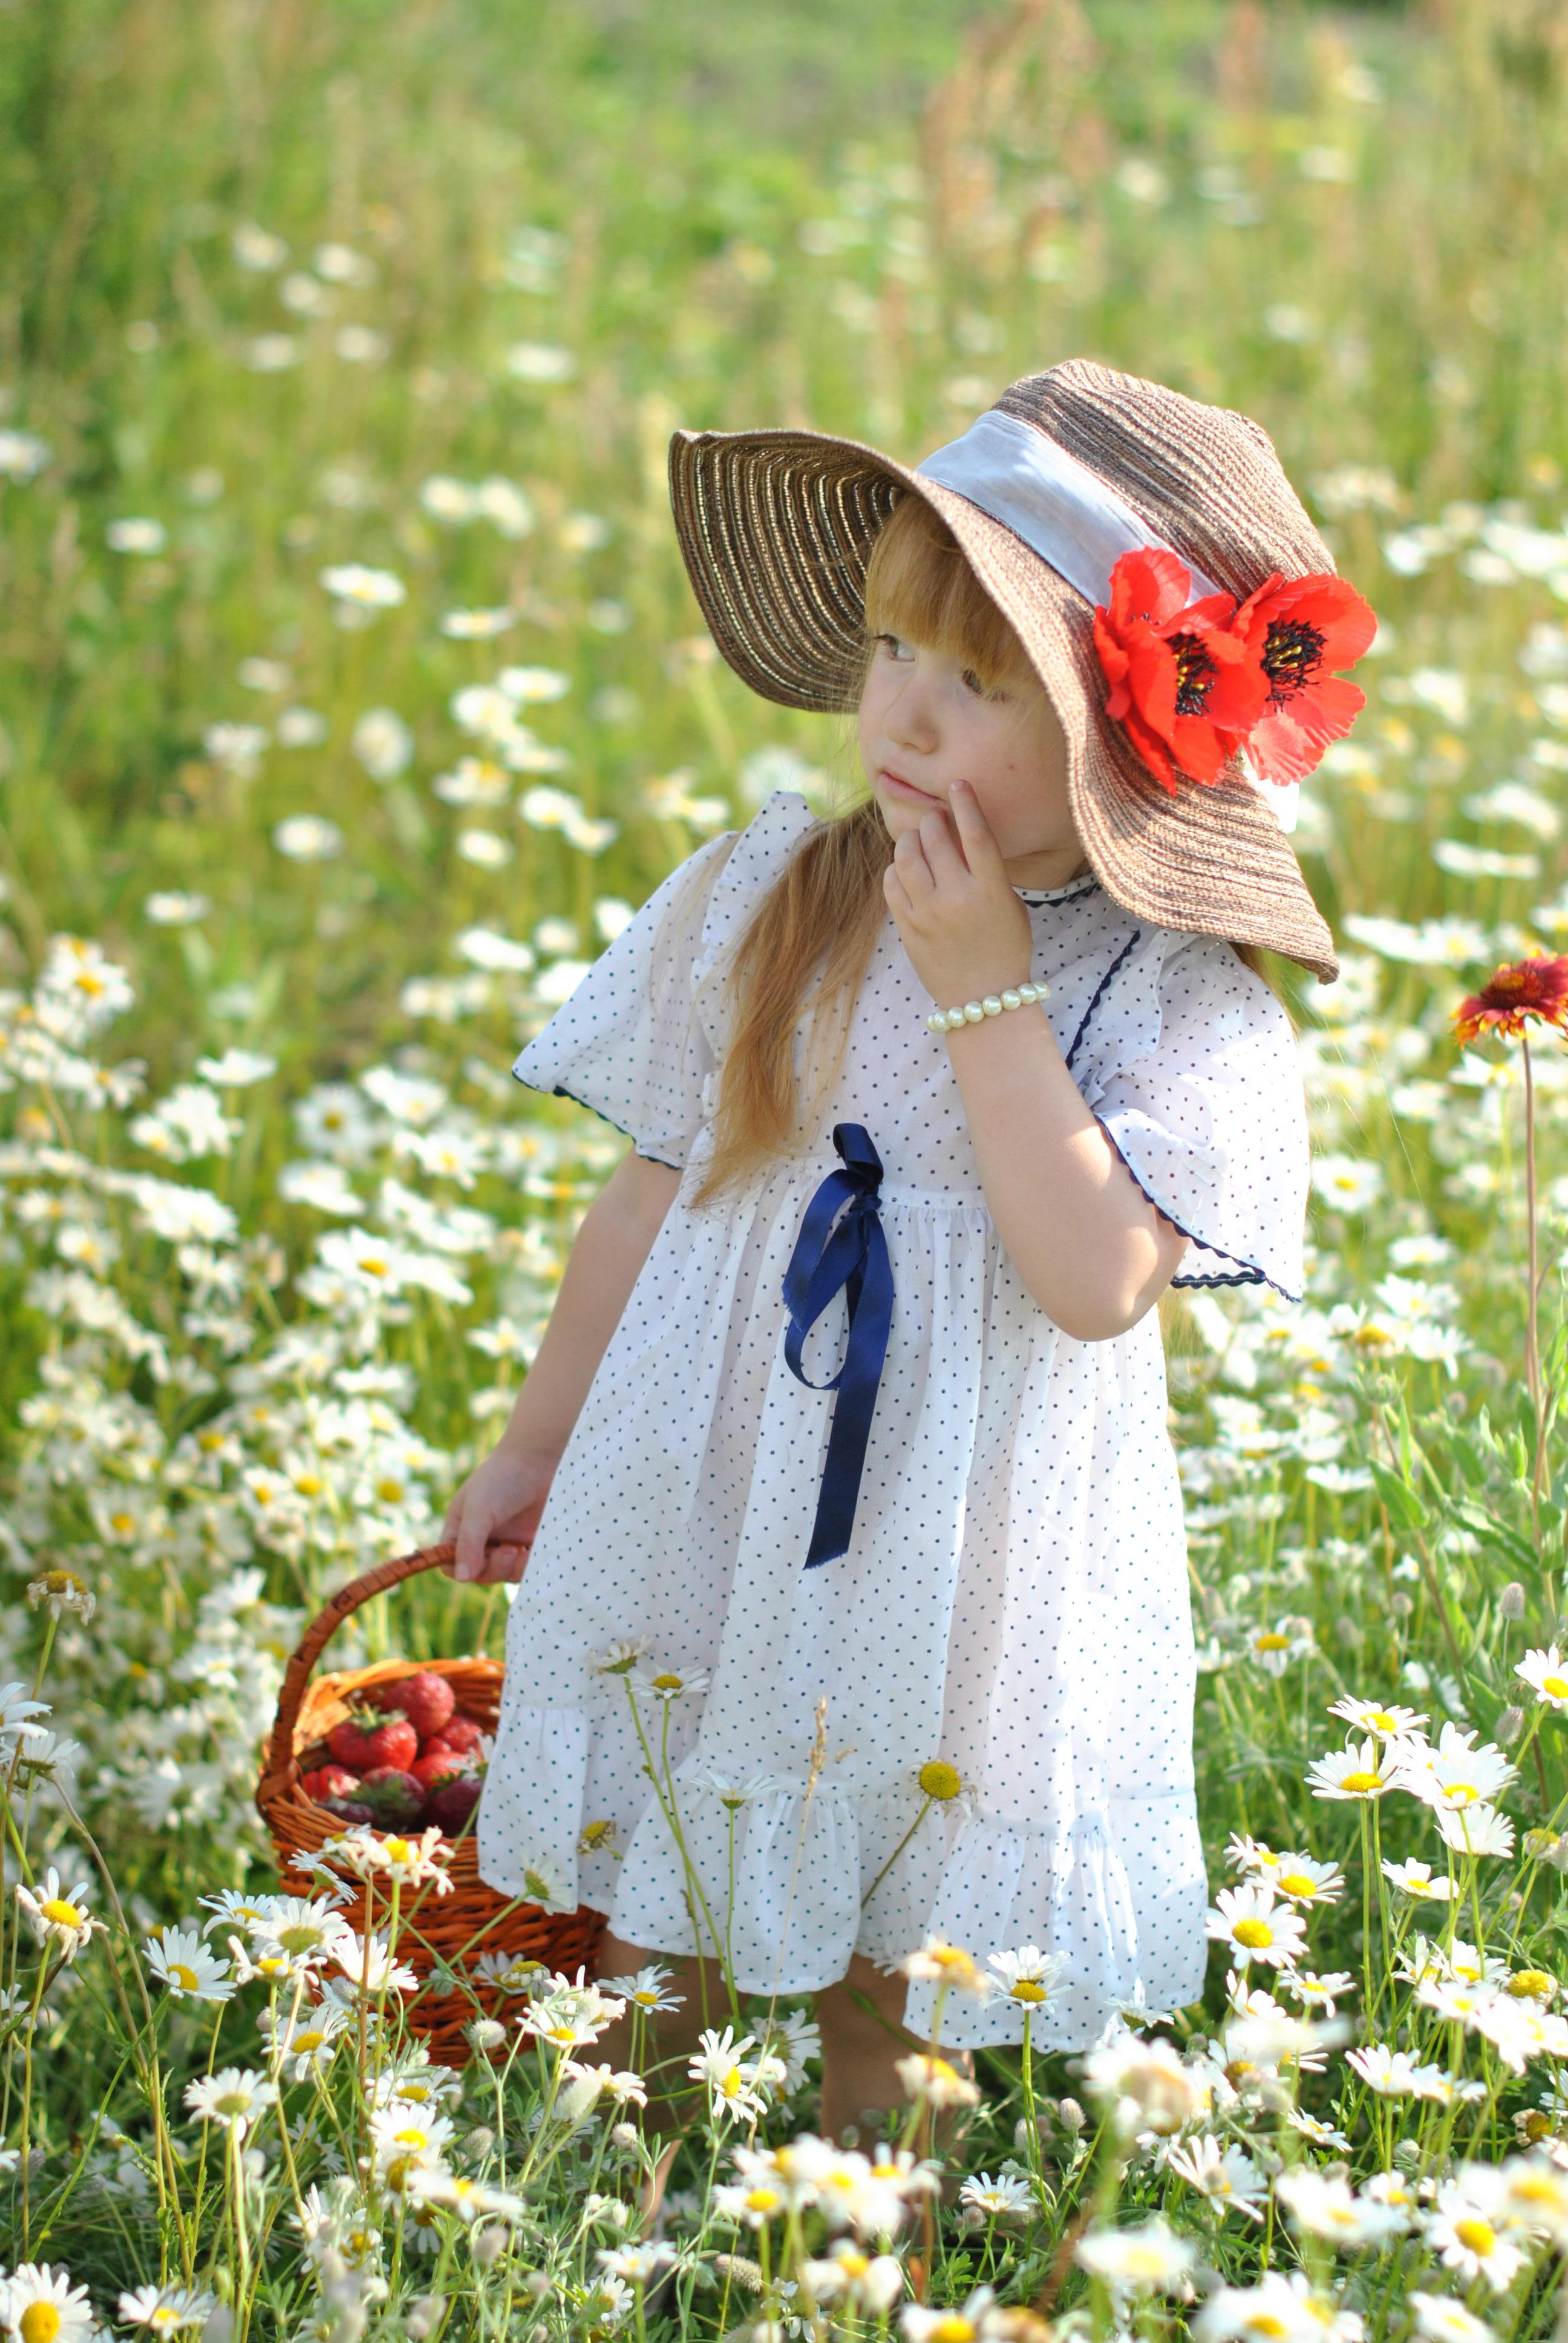 The Summer_6 by anastasiya-landa